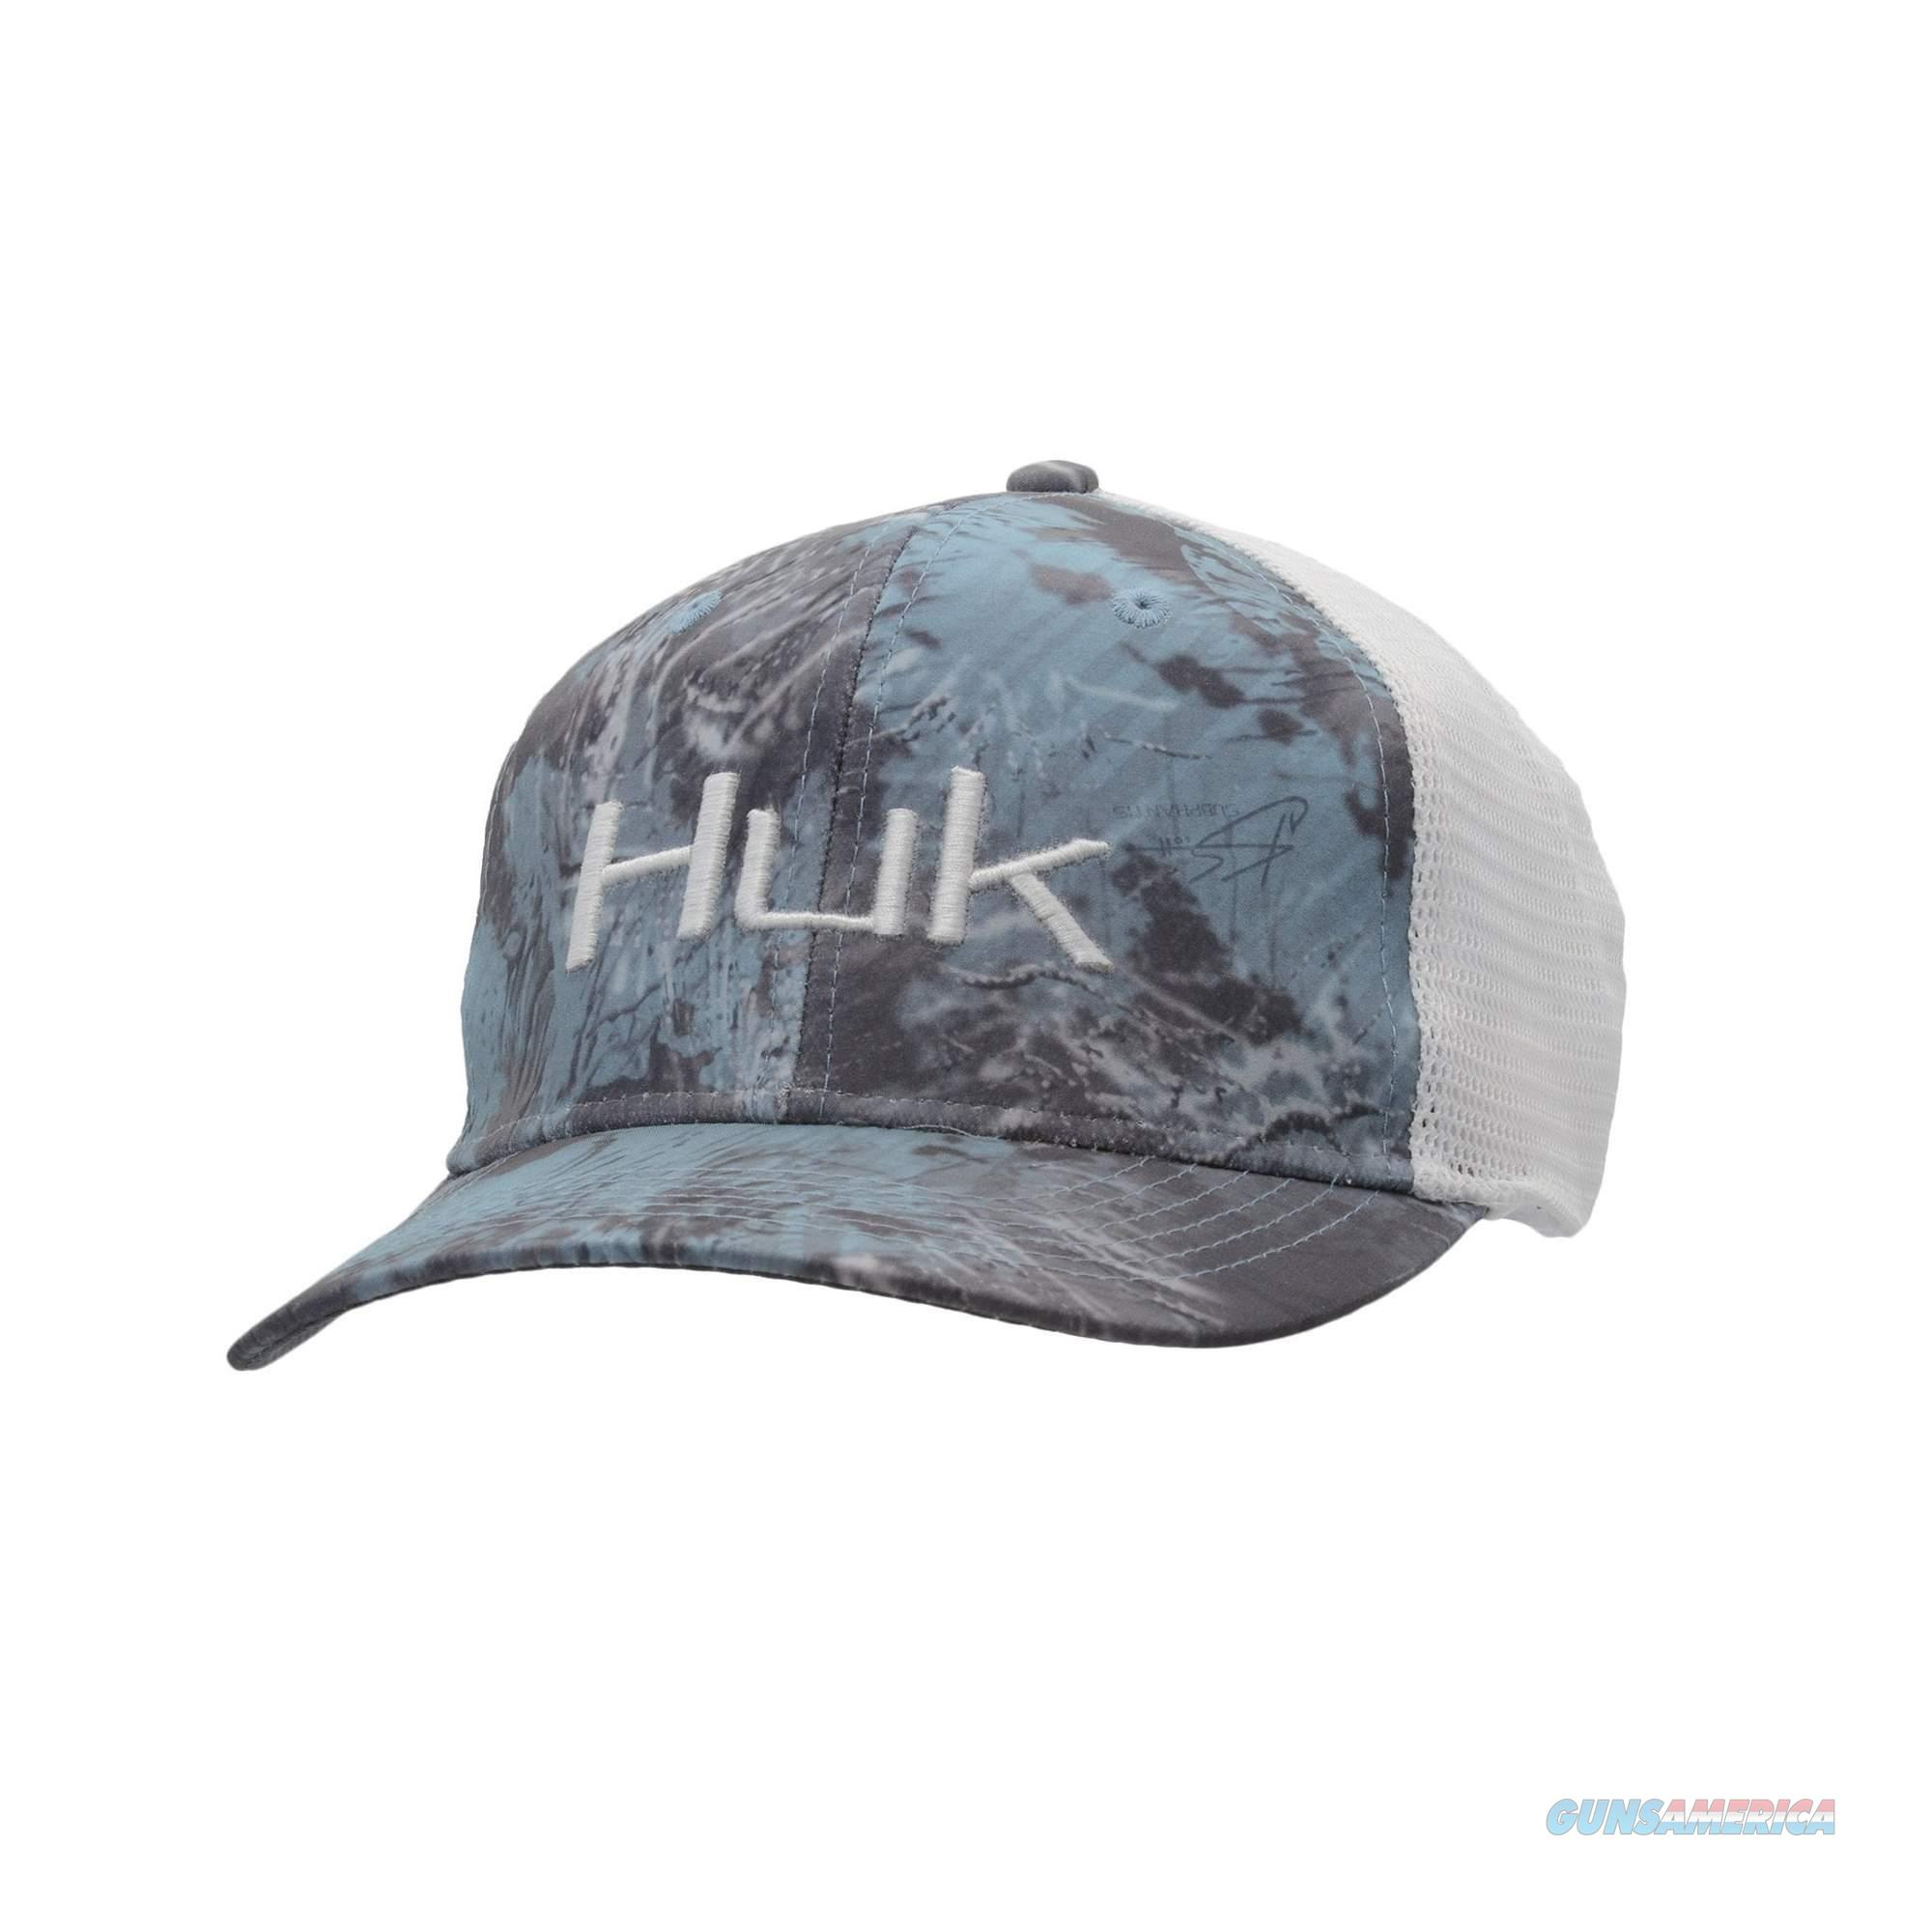 Huk Camo Trucker Stretch Hat Glacier  Non-Guns > Hunting Clothing and Equipment > Clothing > Shirts